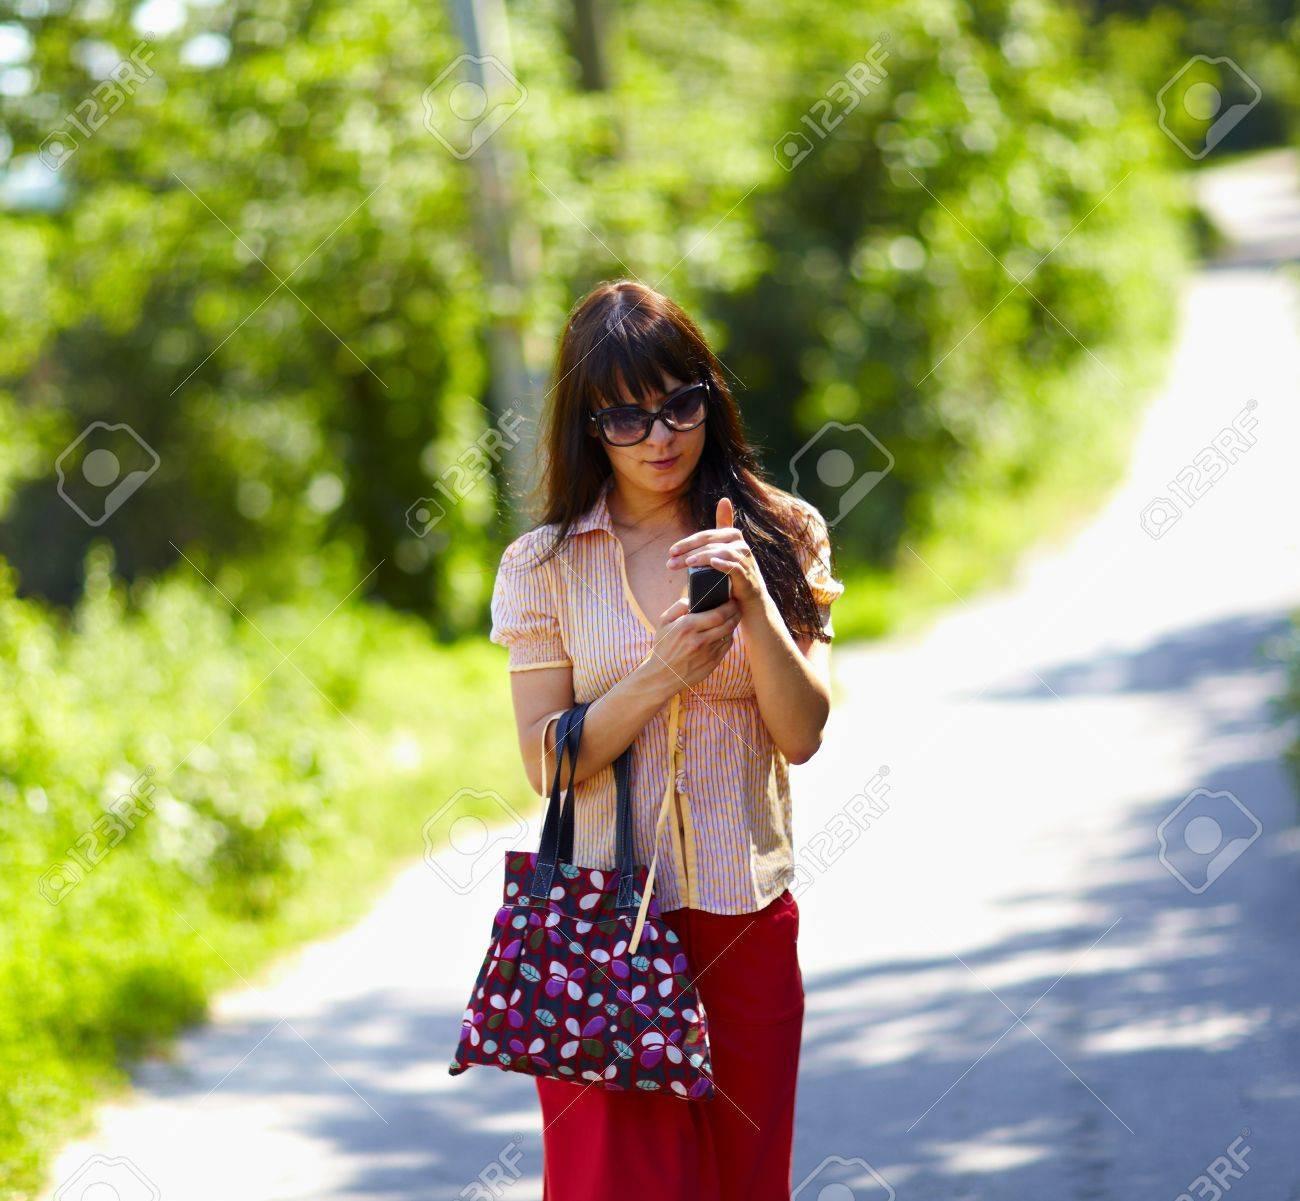 Girl walking the street Stock Photo - 8999647